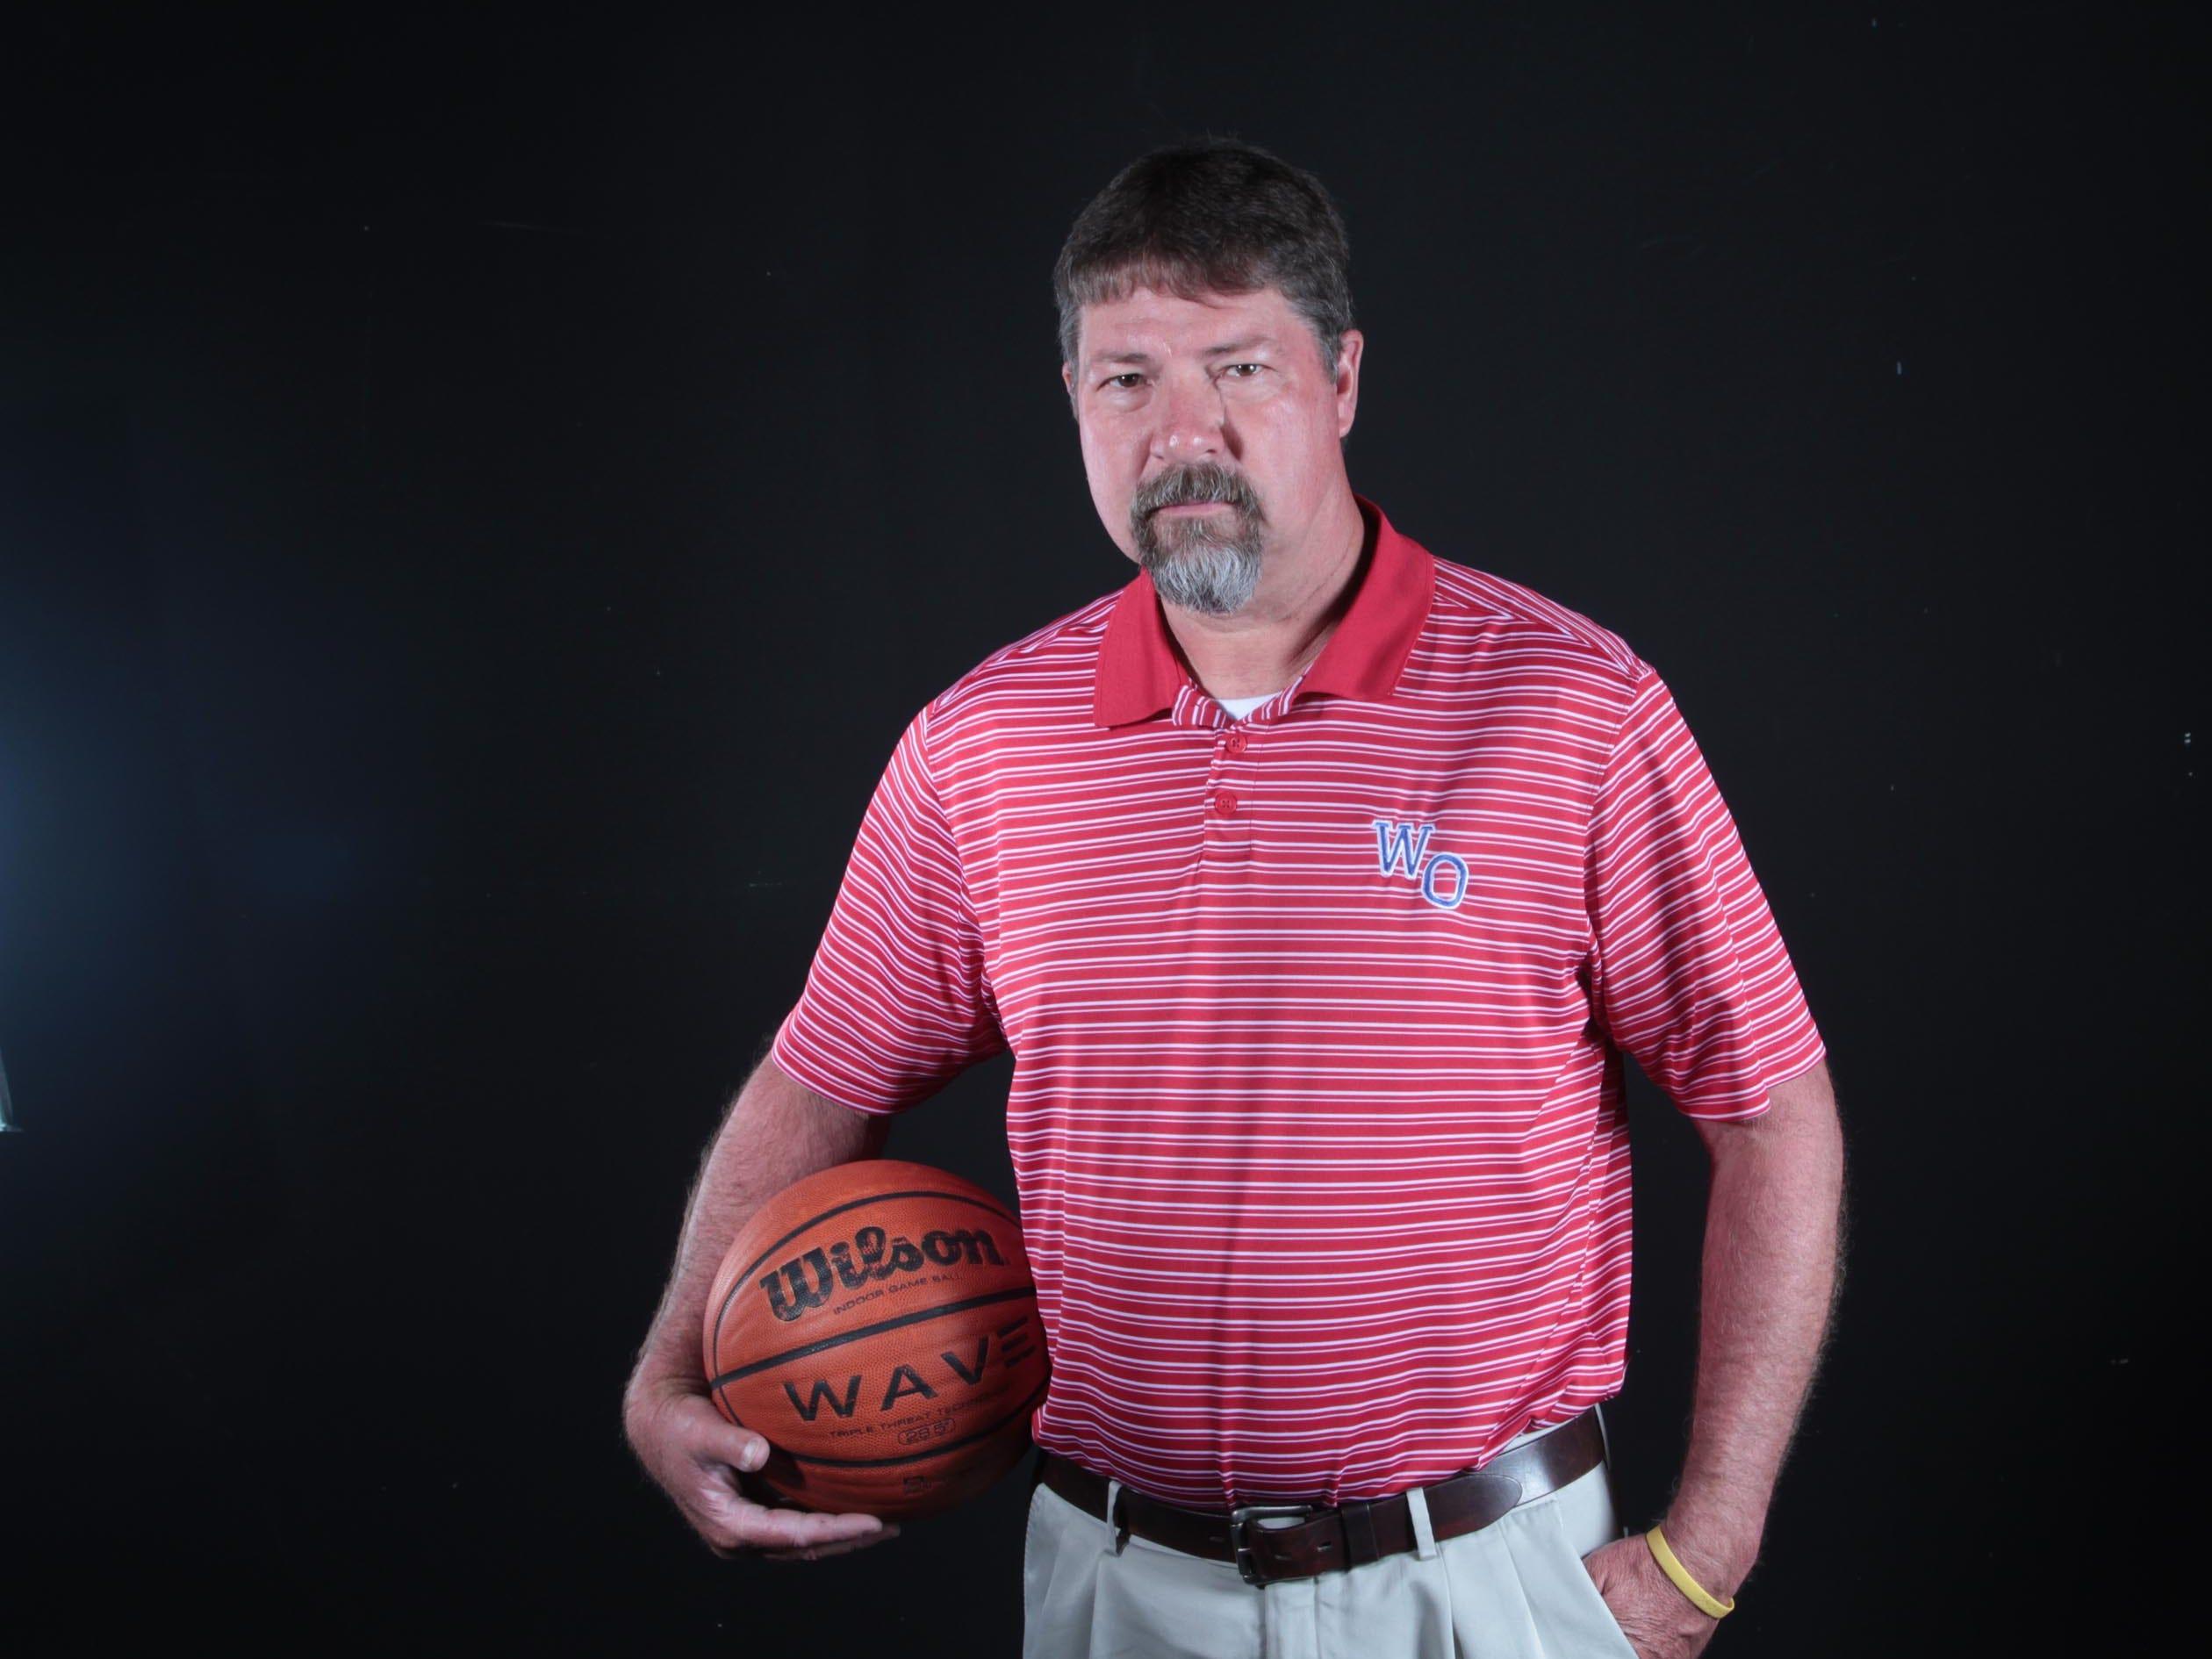 Jimbo Murphy is the All-NELA Big School Girls Coach of the Year